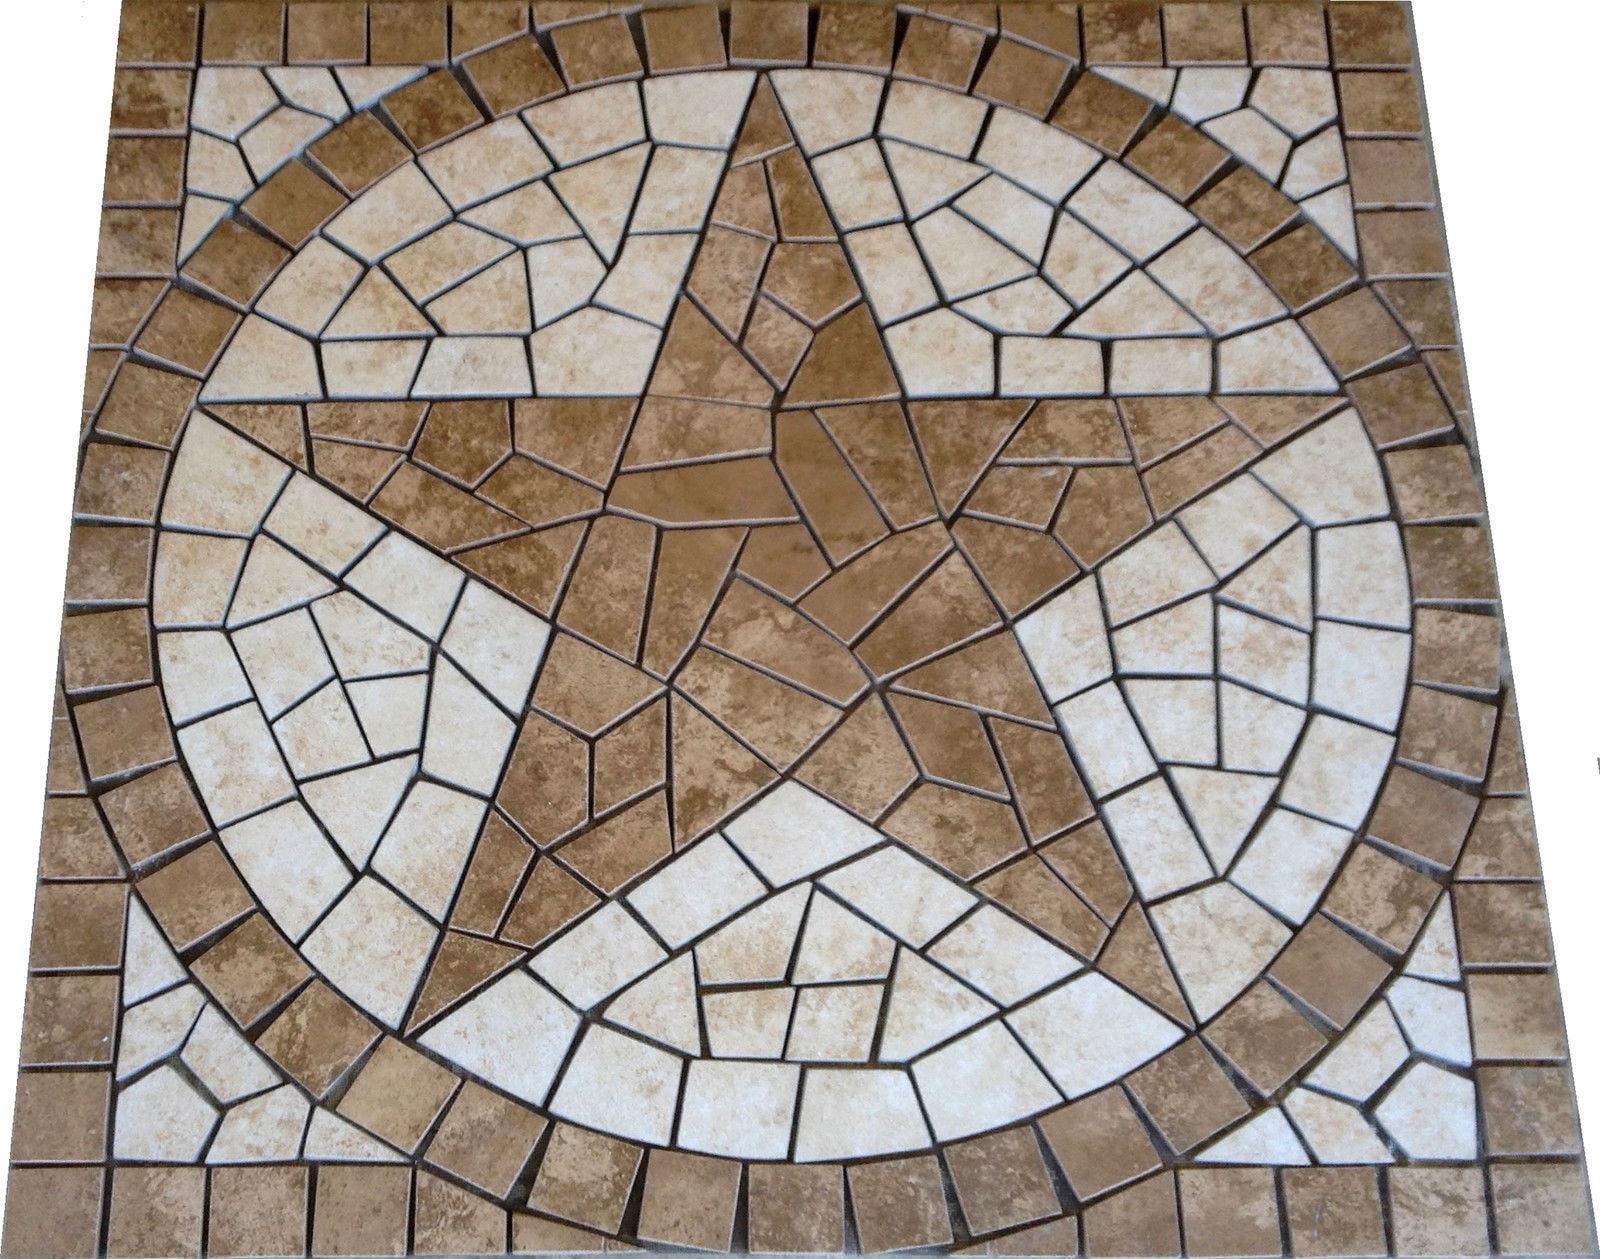 Square charro texas star mosaic porcelain tile medallion description square charro texas star mosaic porcelain tile medallion backsplash wall backsplash kitchen flooring dailygadgetfo Choice Image